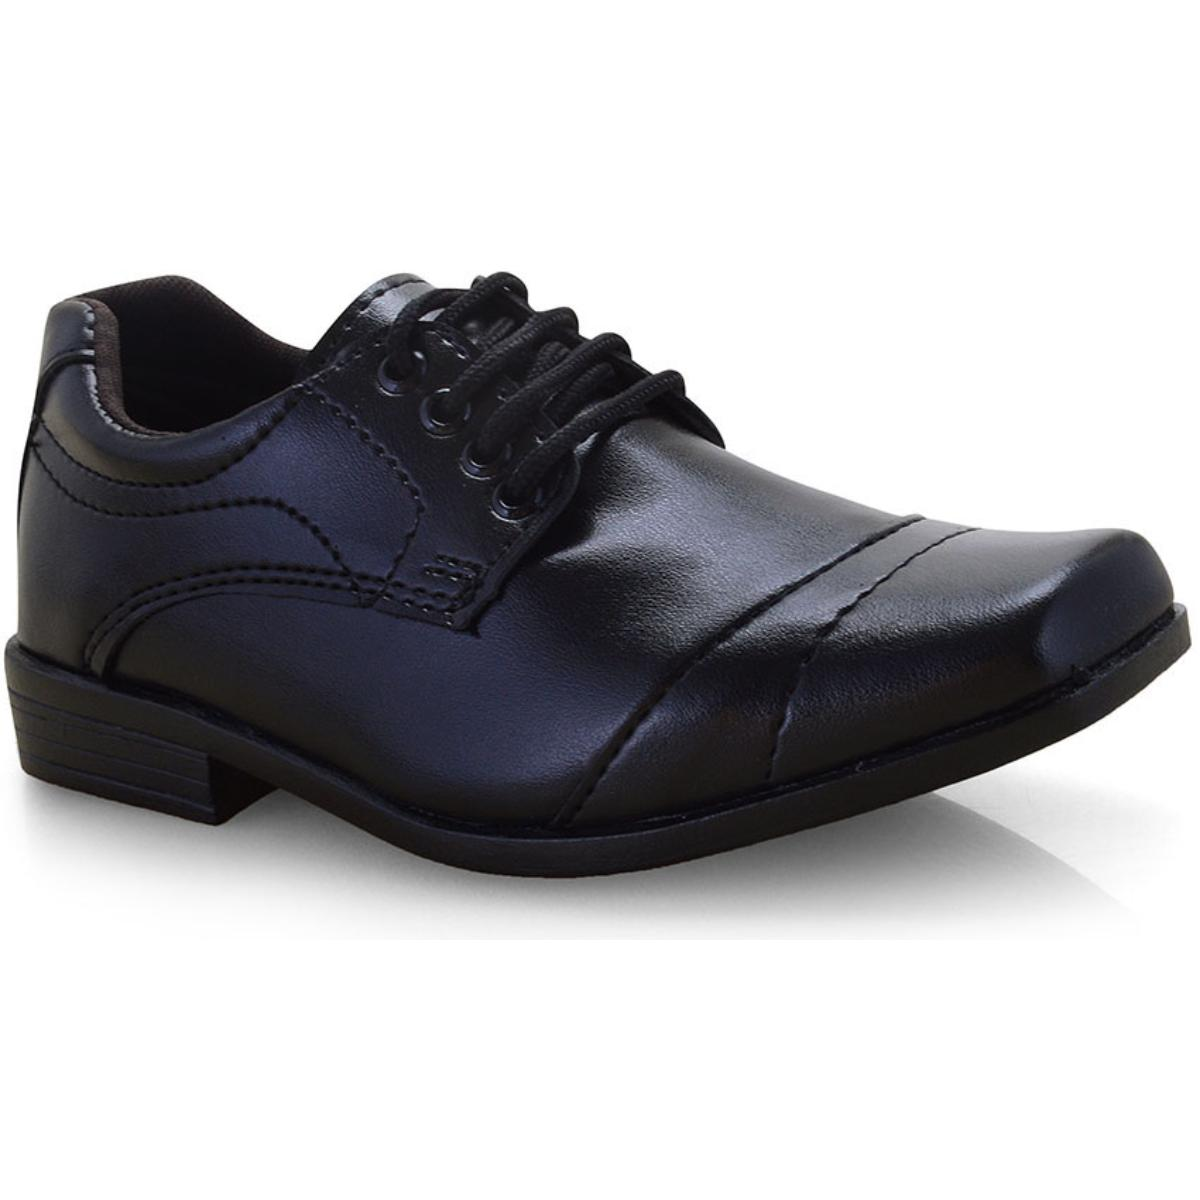 Sapato Masc Infantil Ped Shoes 204 Inf Preto